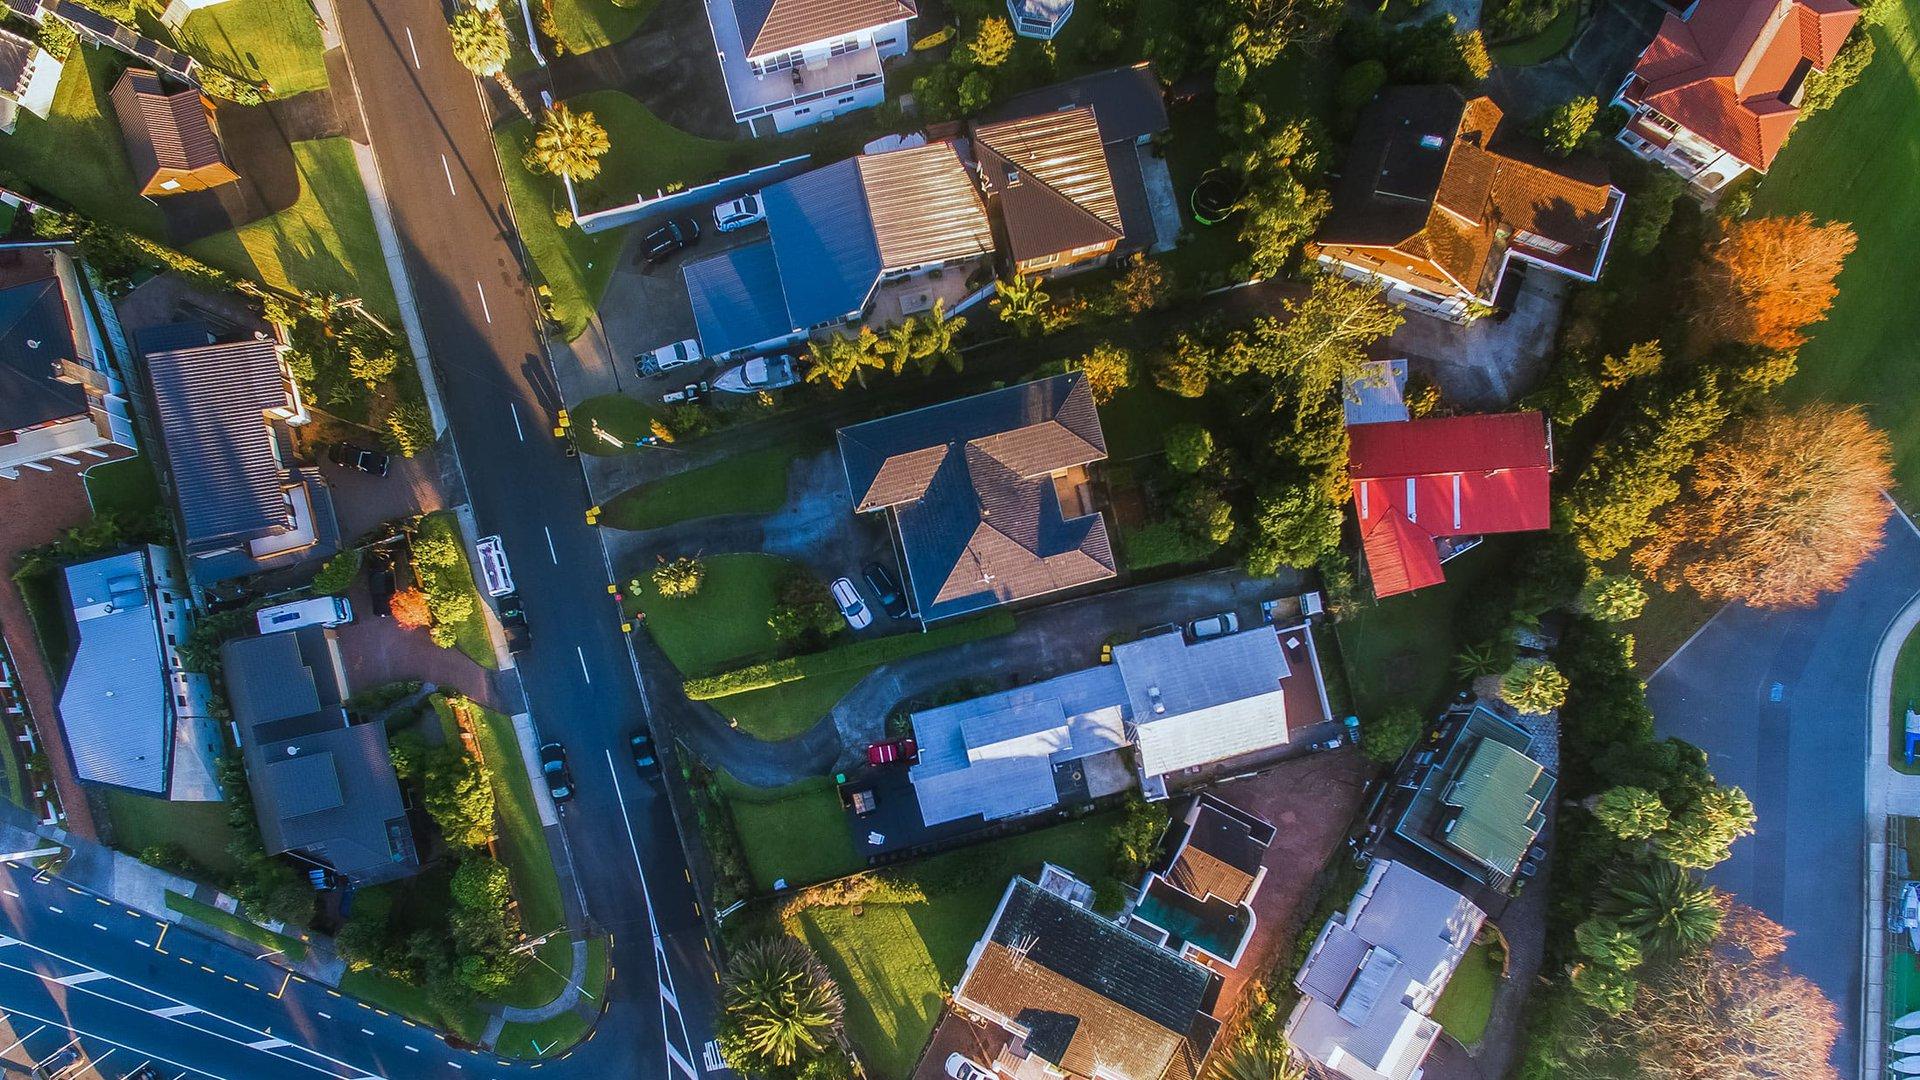 qv-drone.jpg